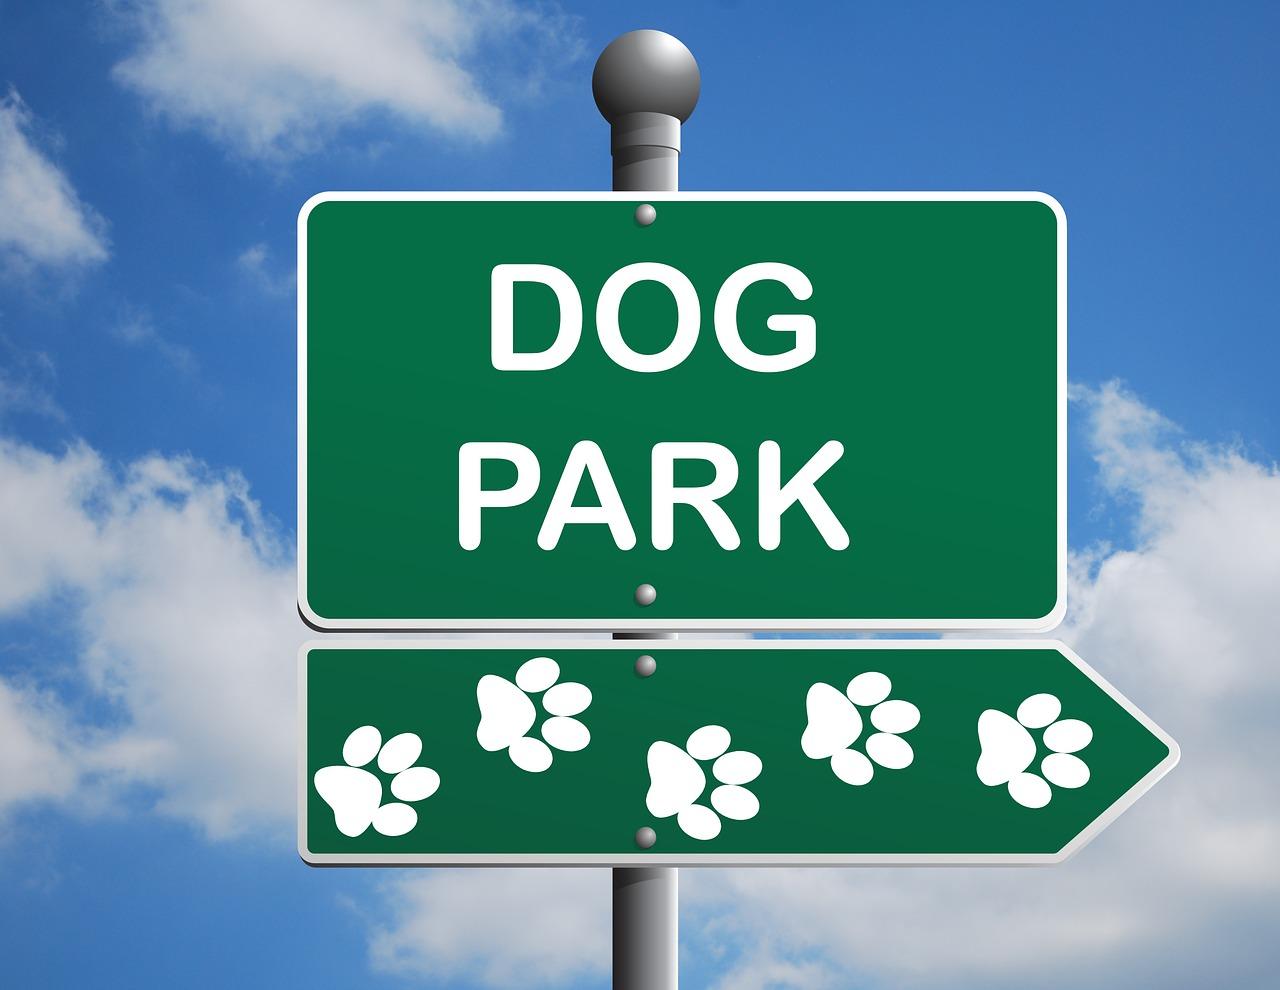 Poochie Park at ATL